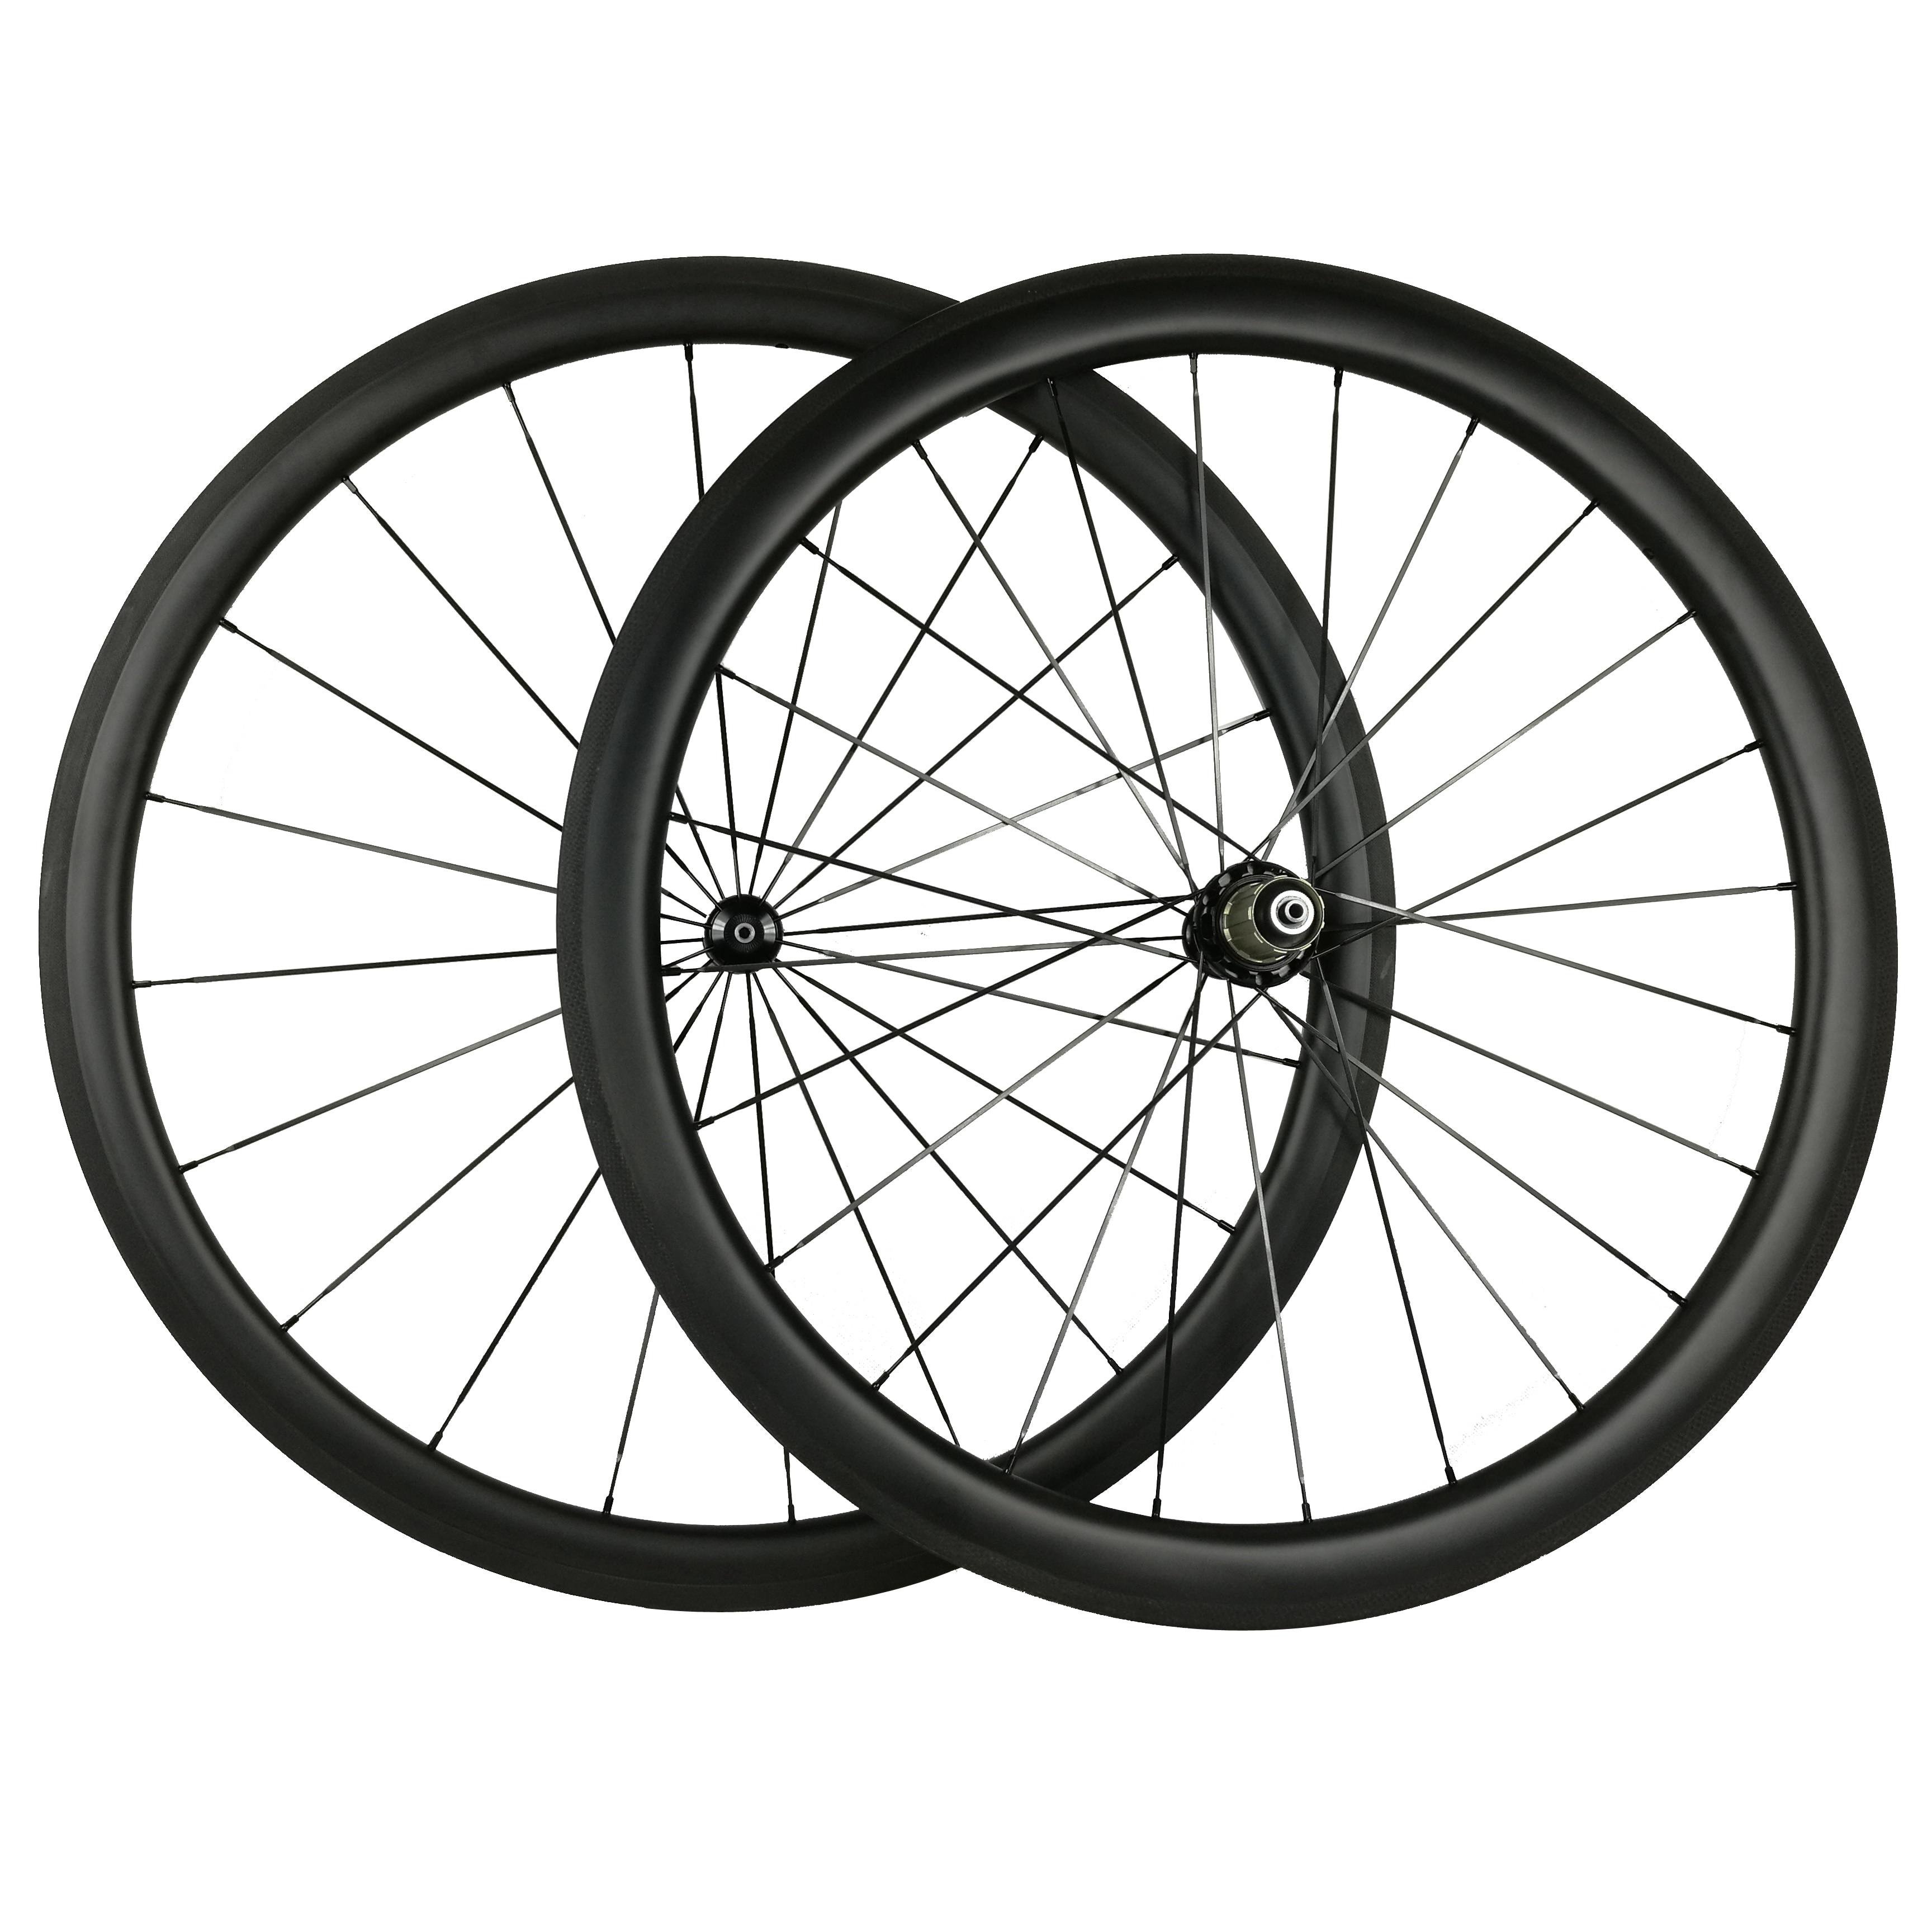 Carbon Wheels Clincher 700C Straight Pull R36 Hub Roue Carbone 30/50/88MM Pneu Wheels Bike Road 25MM Width U Shape(China)